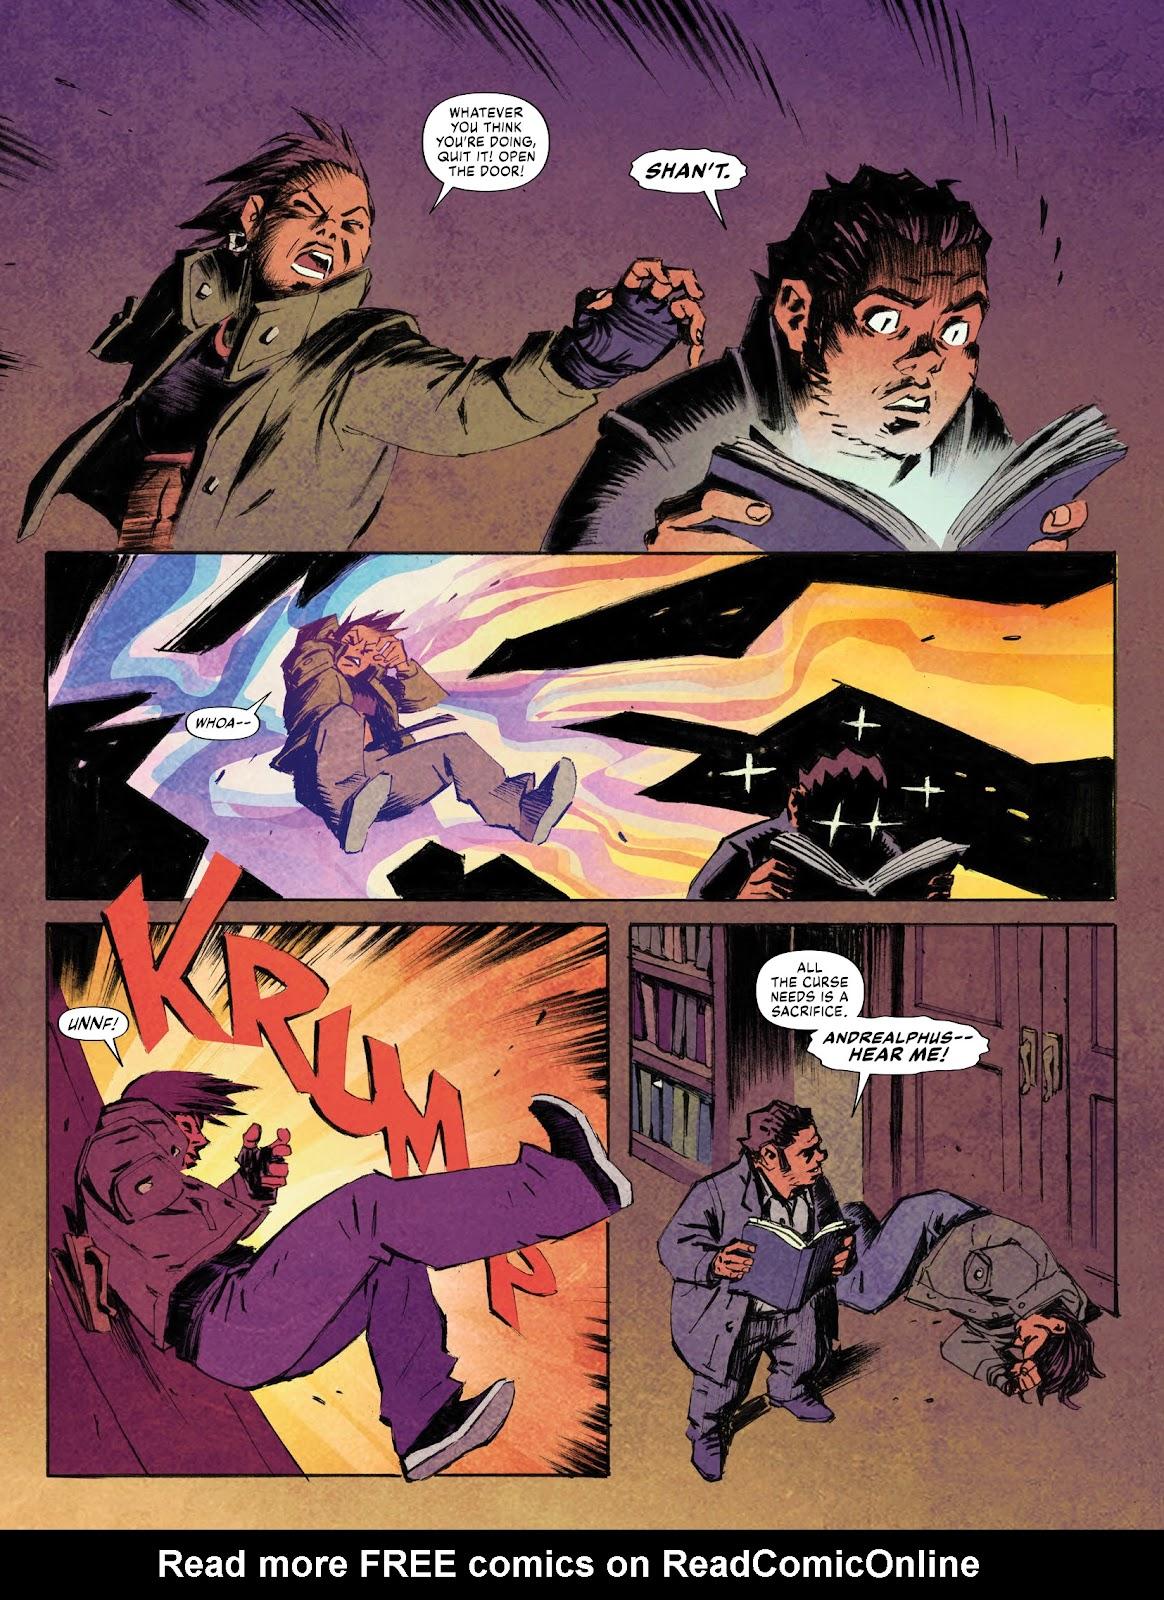 Judge Dredd Megazine (Vol. 5) issue 427 - Page 49